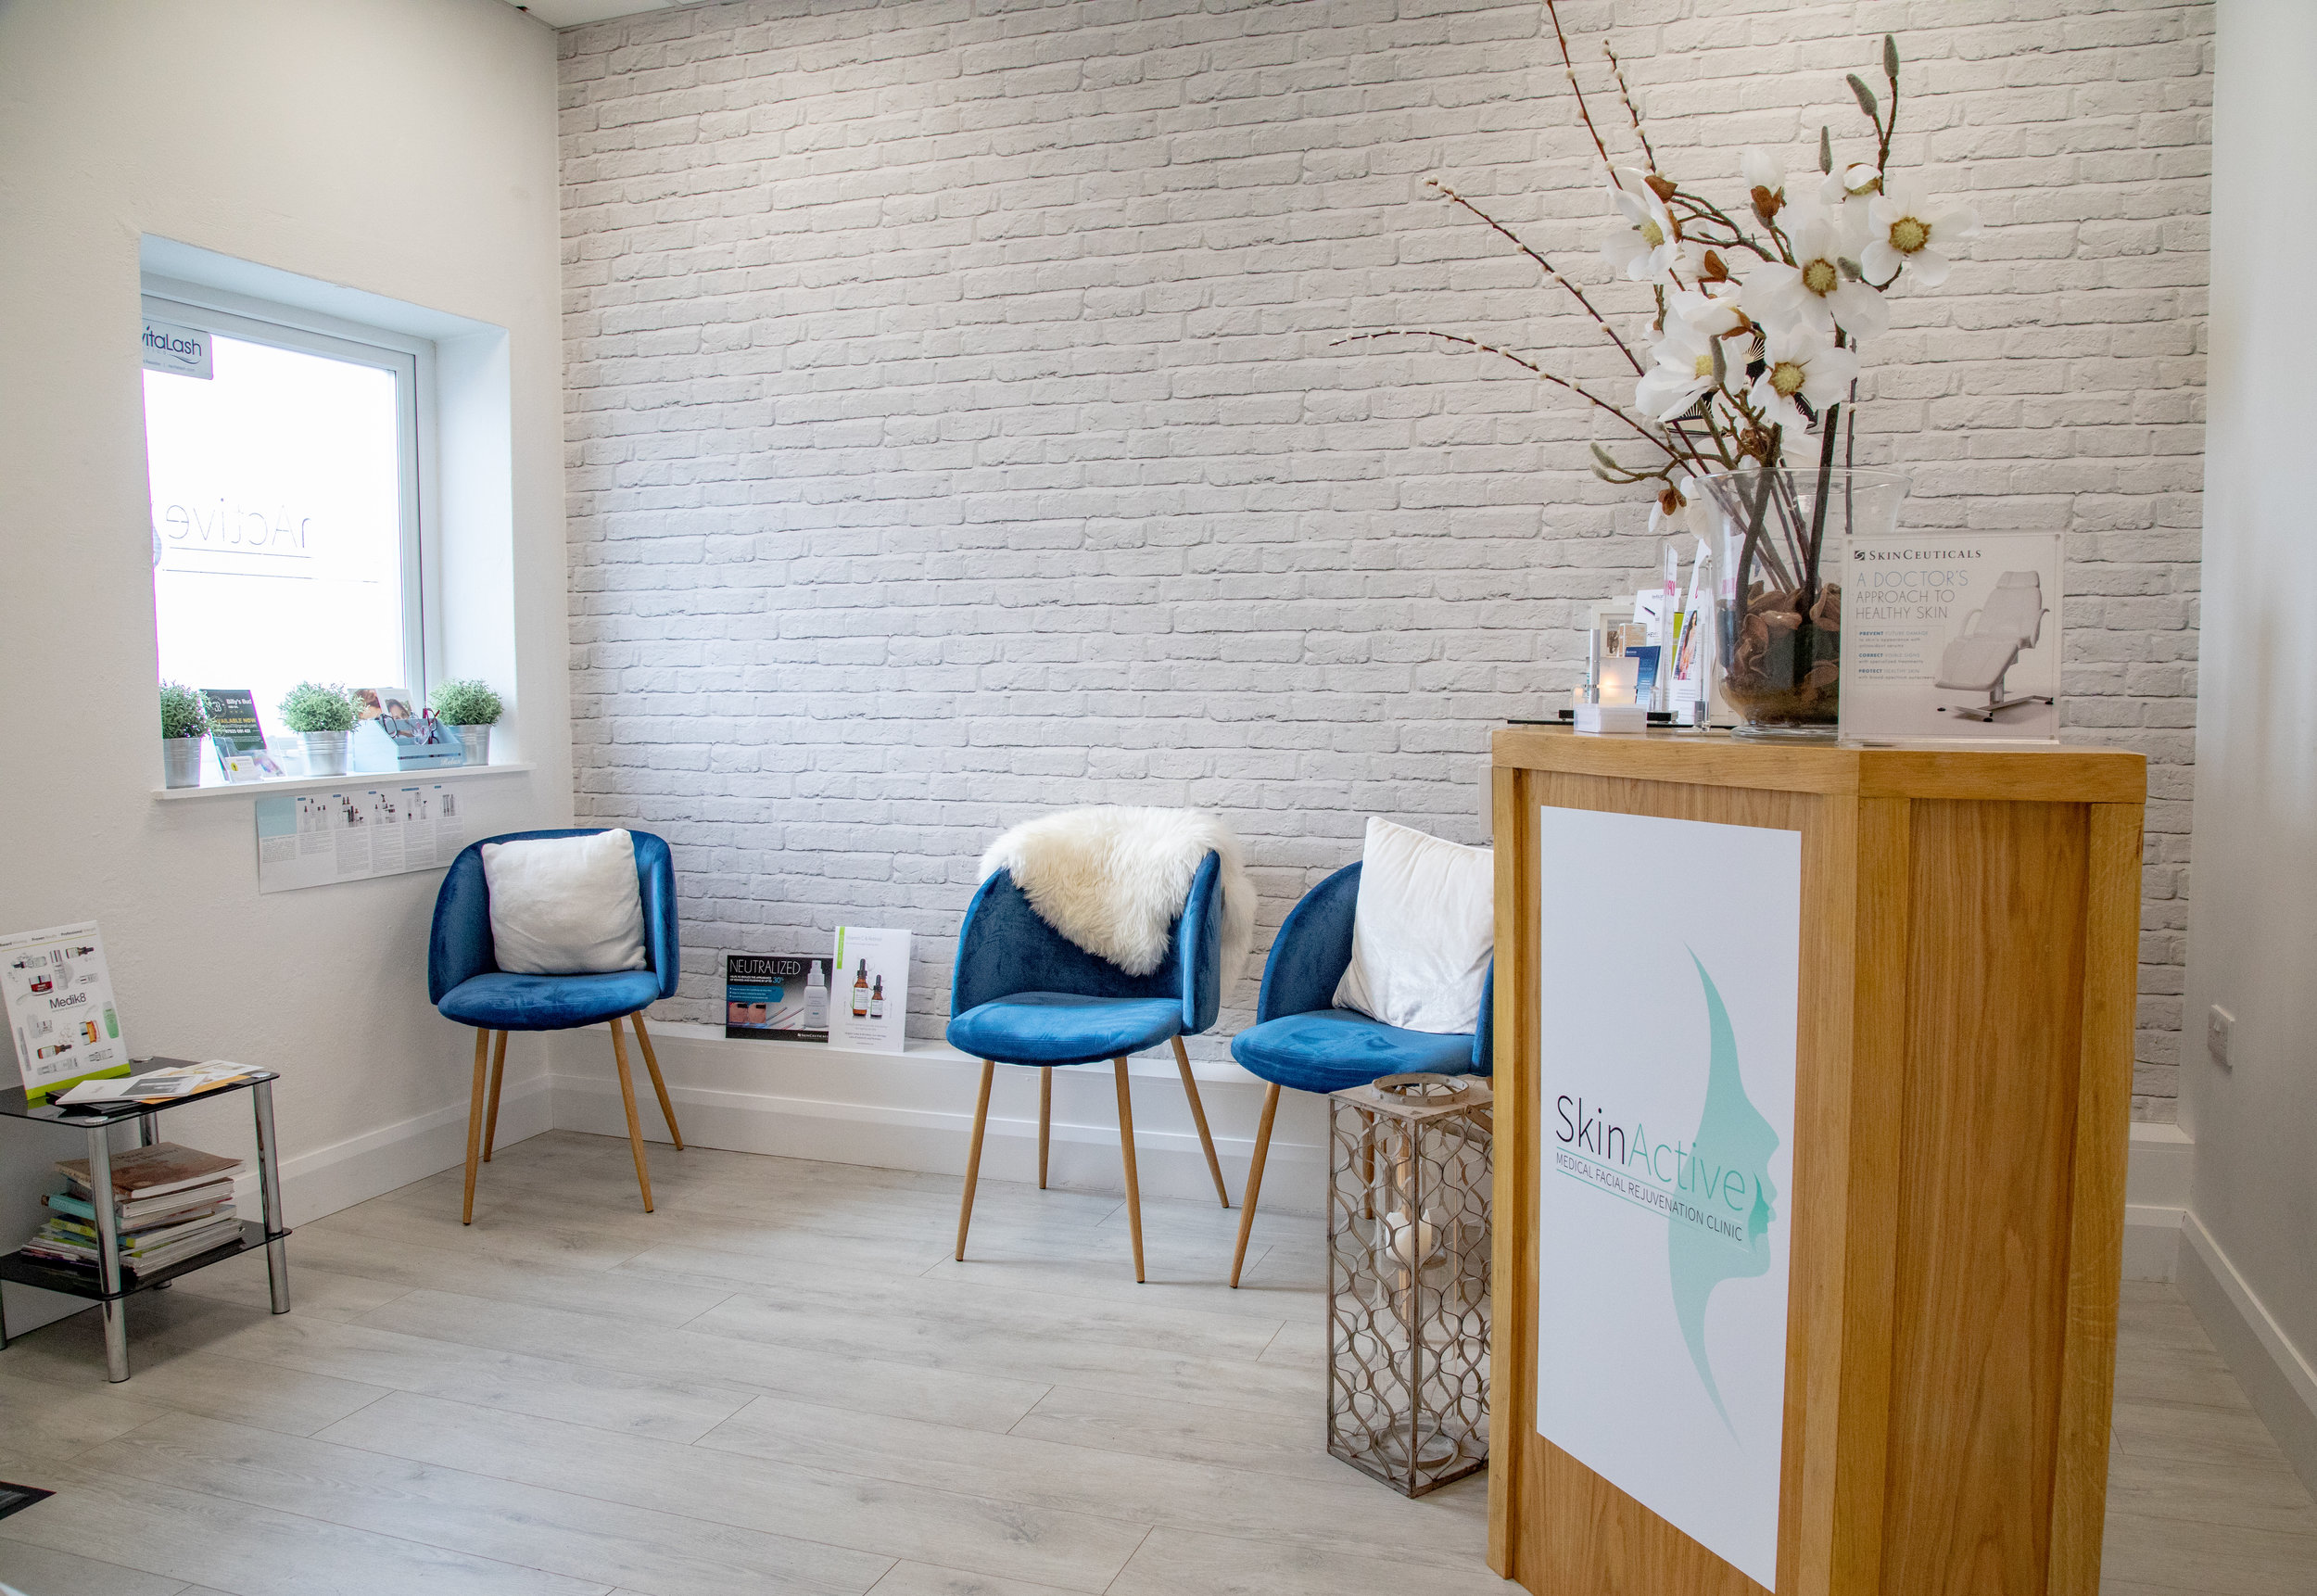 Skin Active Clinic.jpg